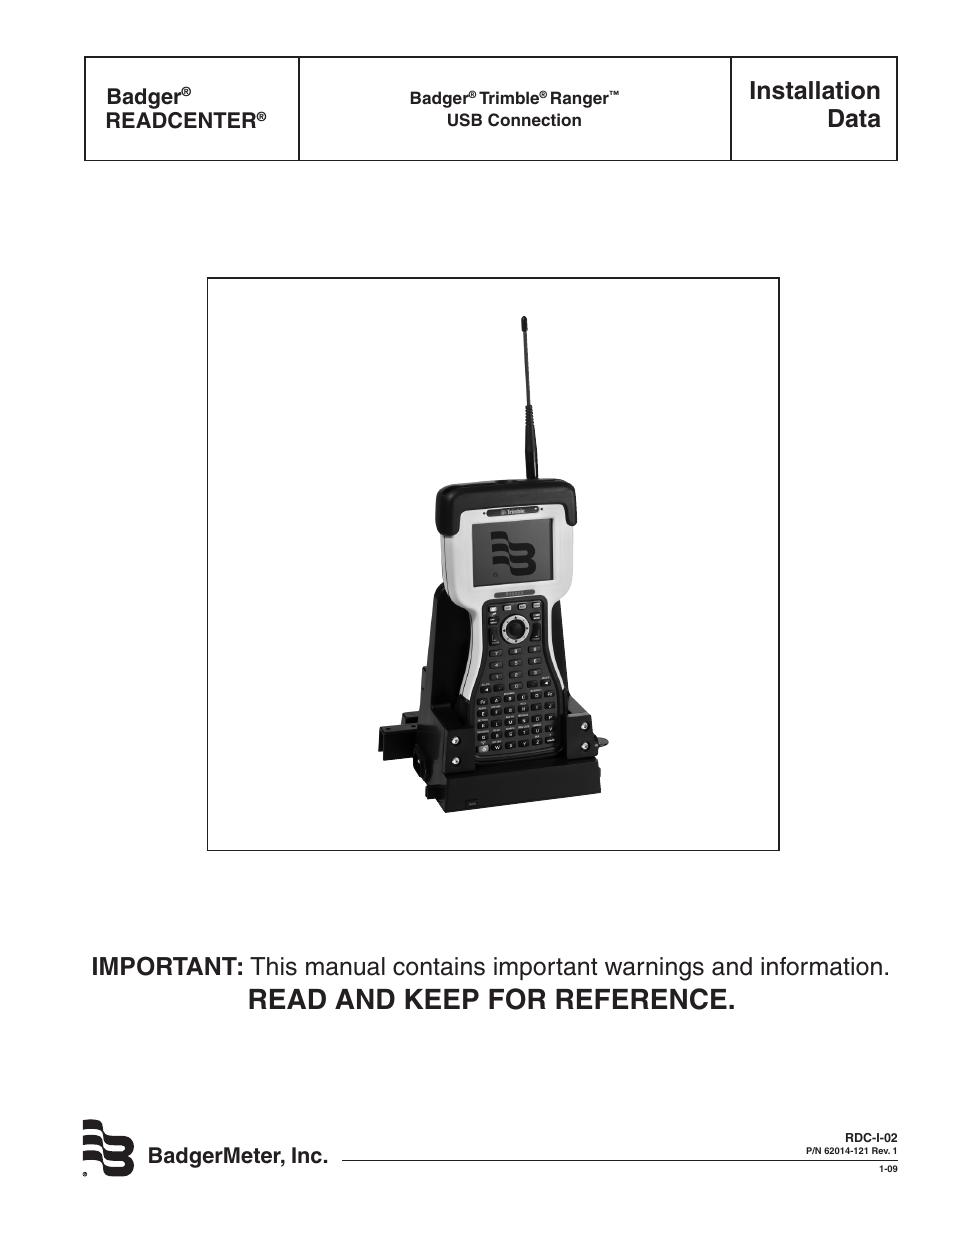 Badger Meter Readcenter User Manual